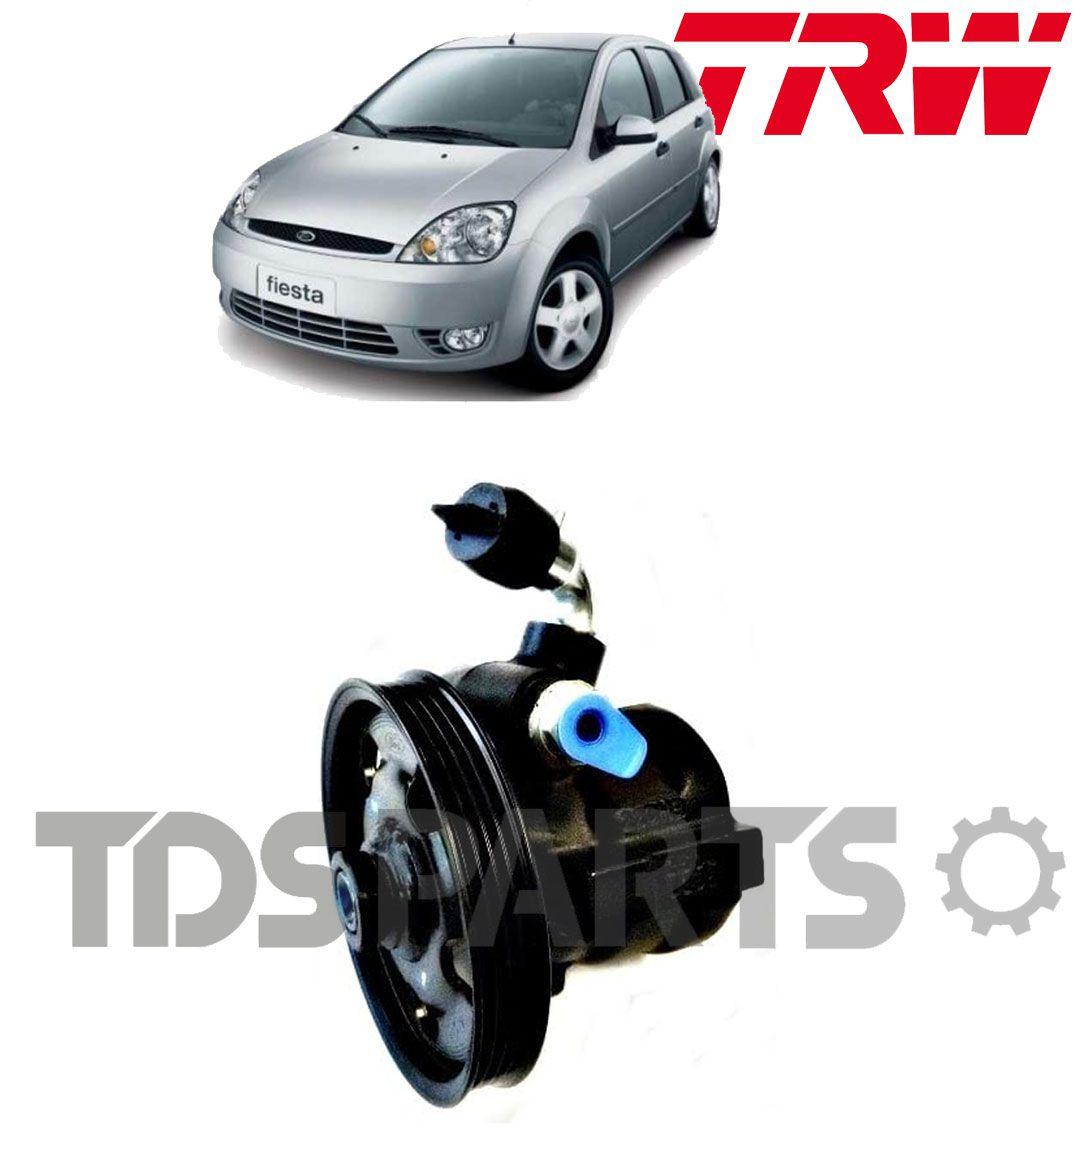 Bomba De Direção Hidráulica Ford Fiesta Supercharger (TRW)